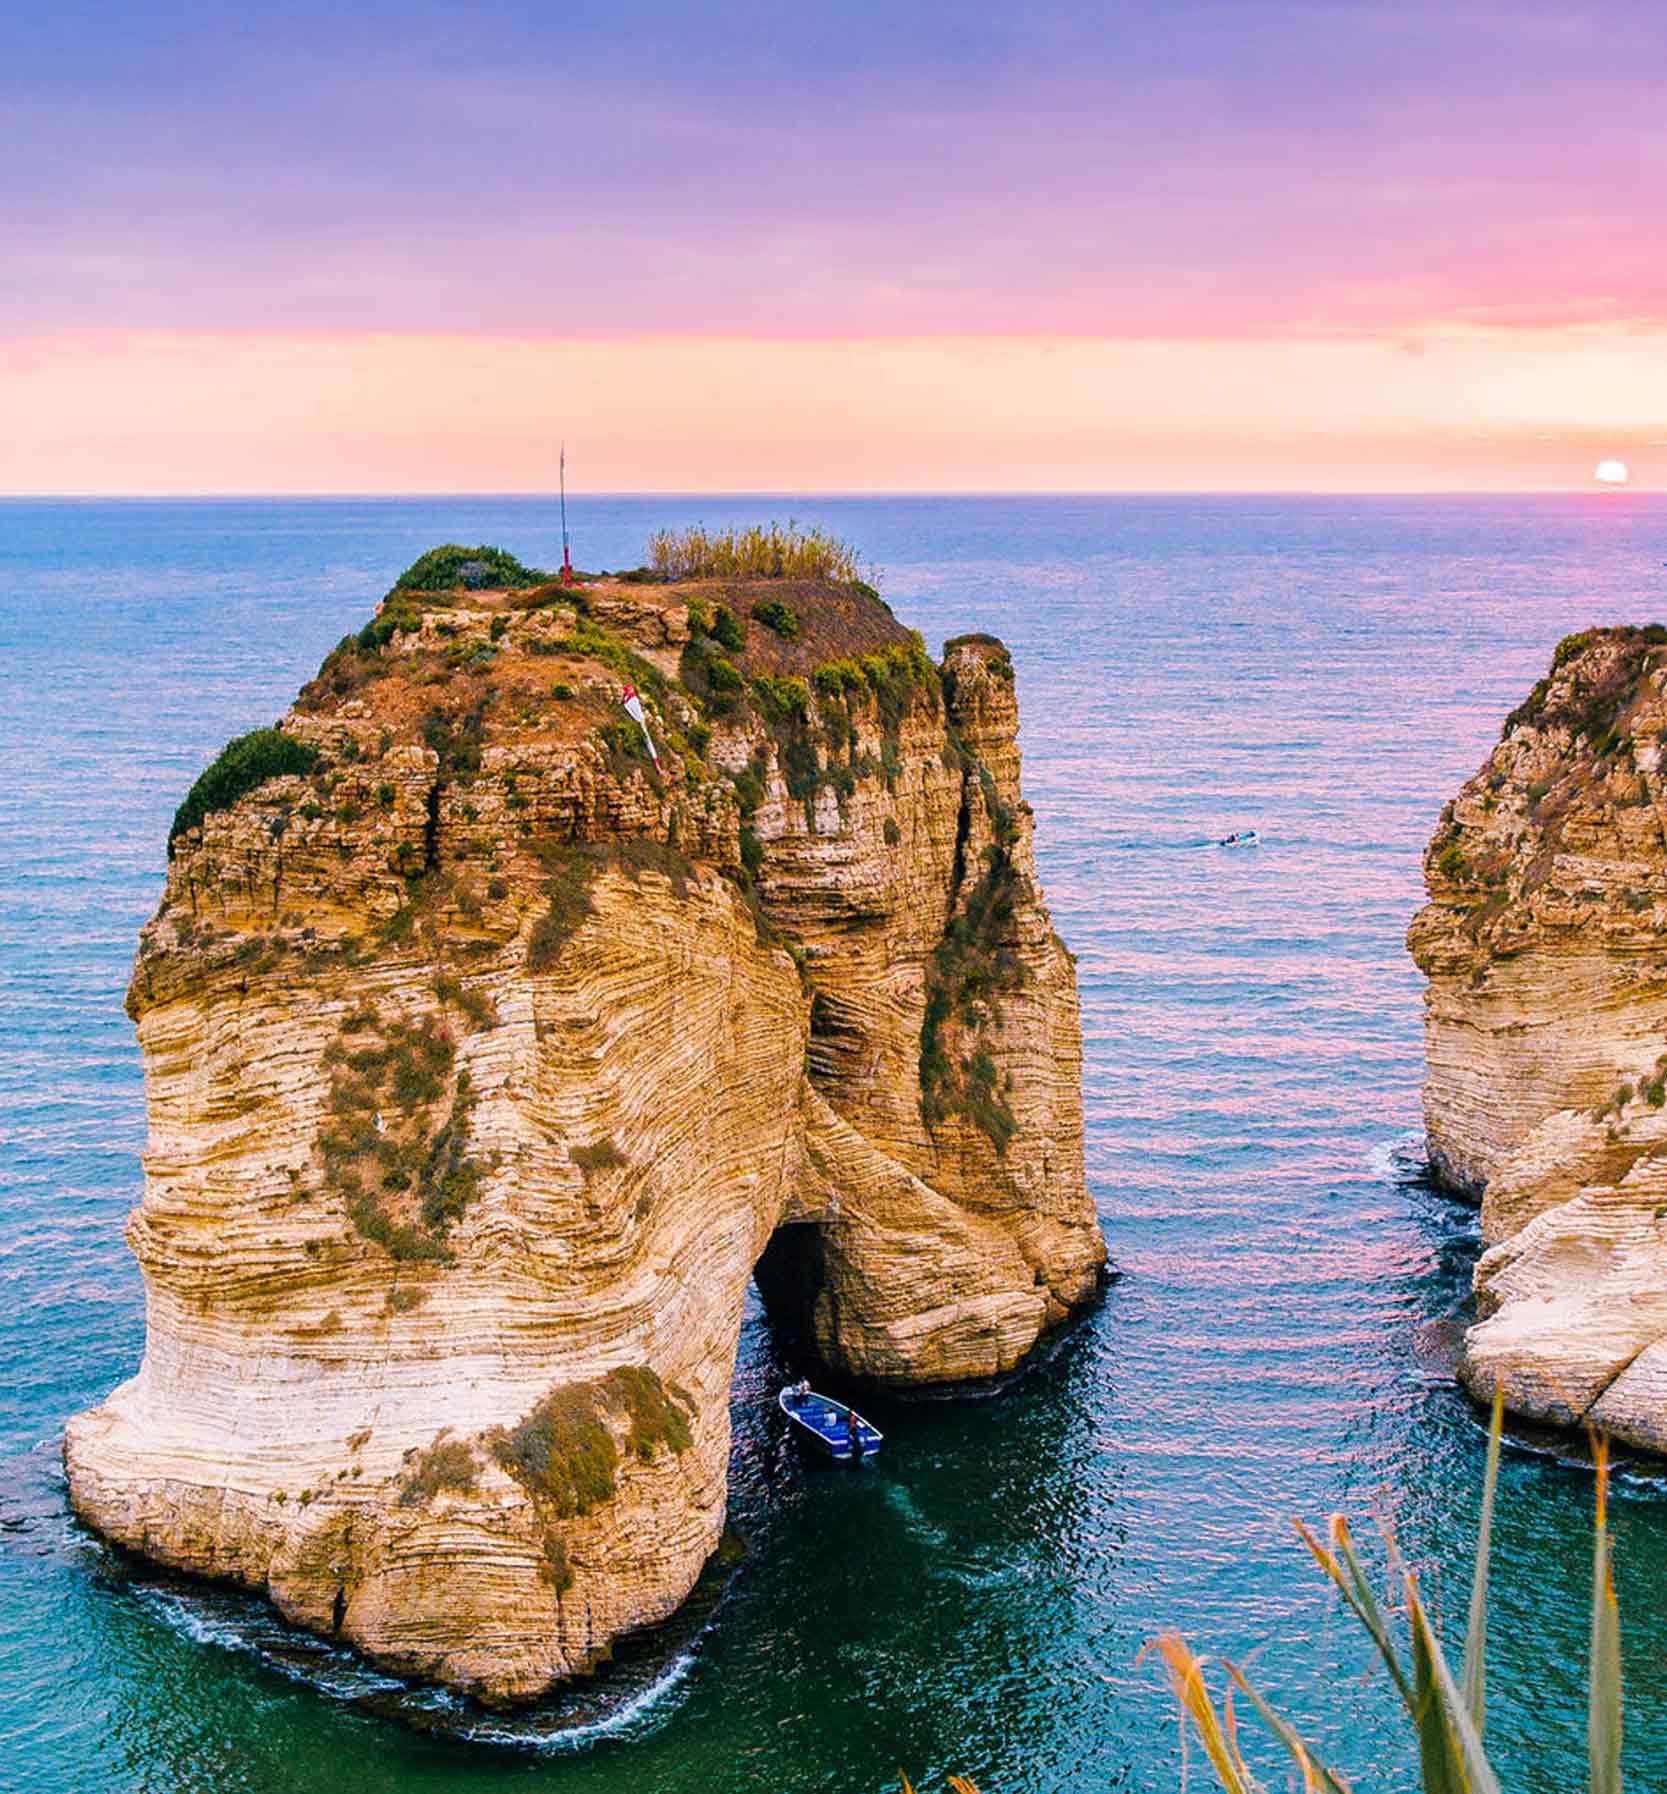 Beirut Sea View image